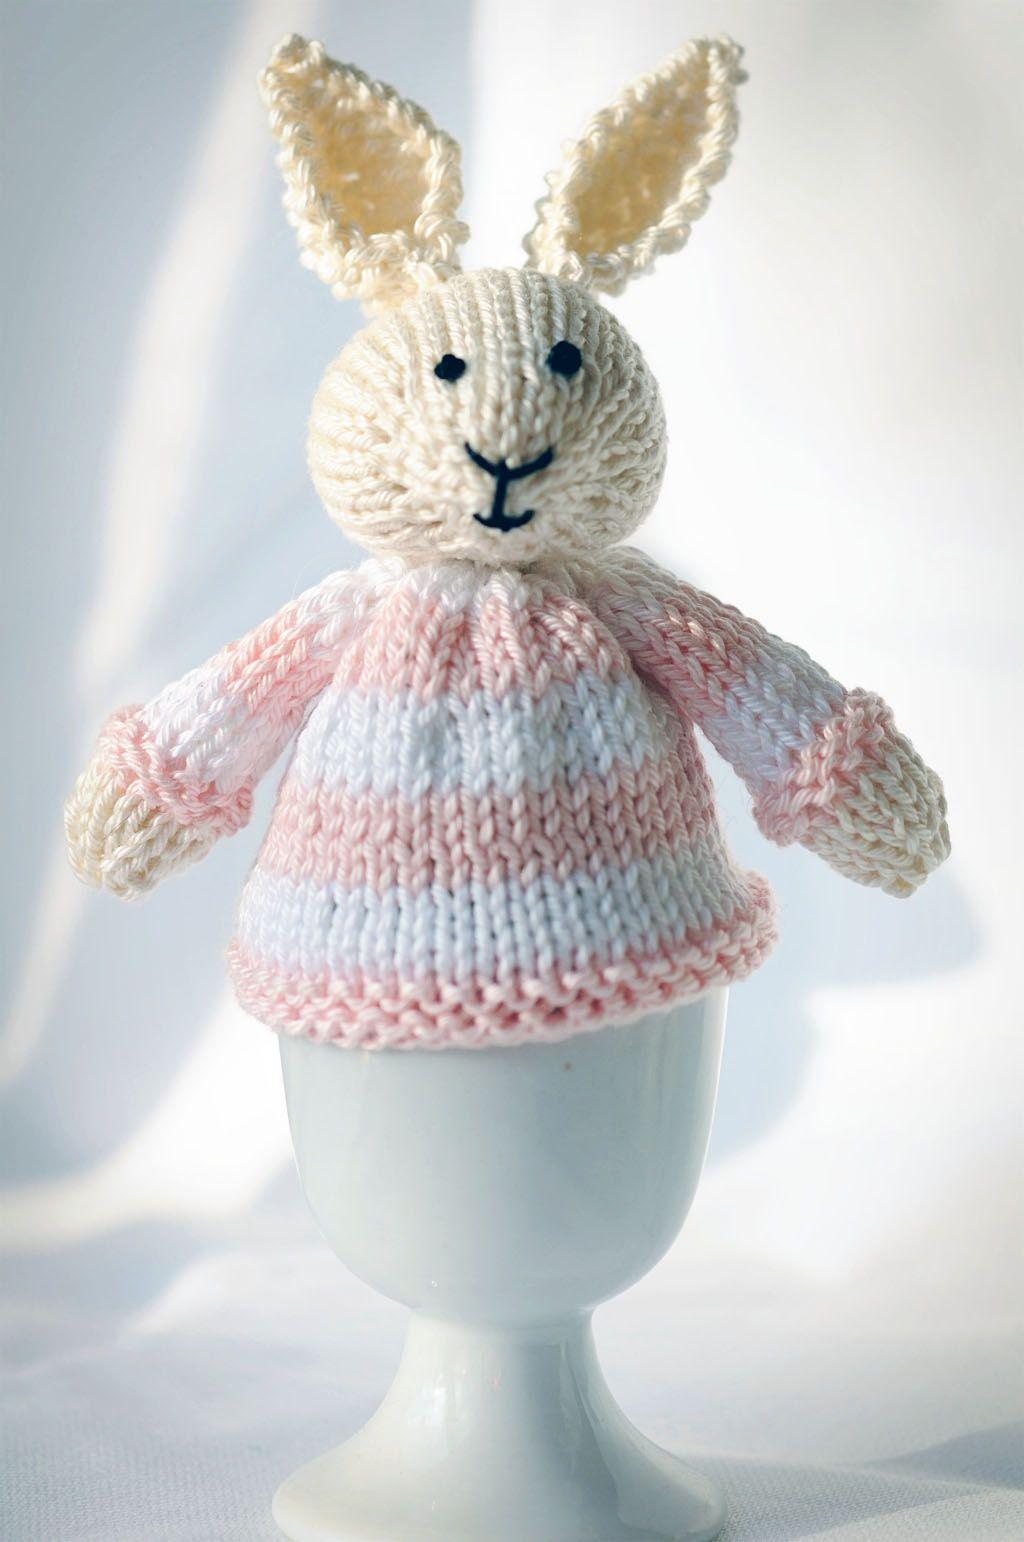 Rabbit Egg Cozy | Páscoa/Easter/Pascua | Pinterest | Egg cups, Egg ...